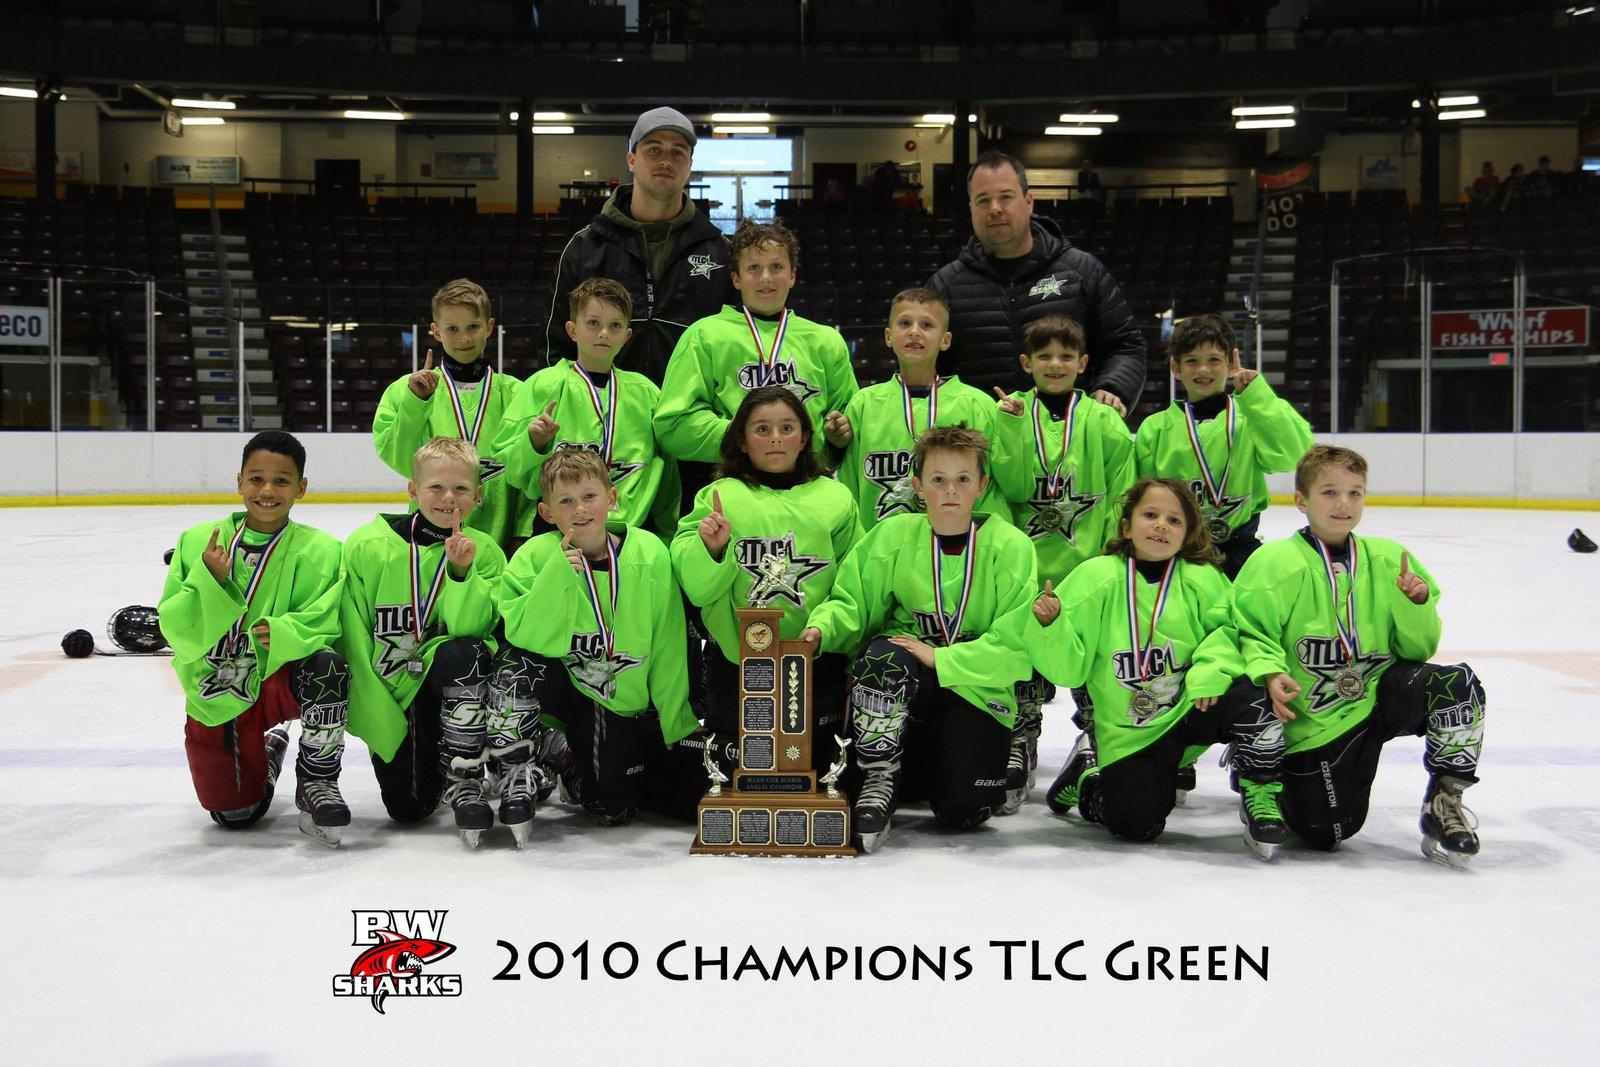 2010-Champions-TLC-Green-SilverPeak-Studios-Canada-Sarnia-Bluewater-Sharks-Tournament-001